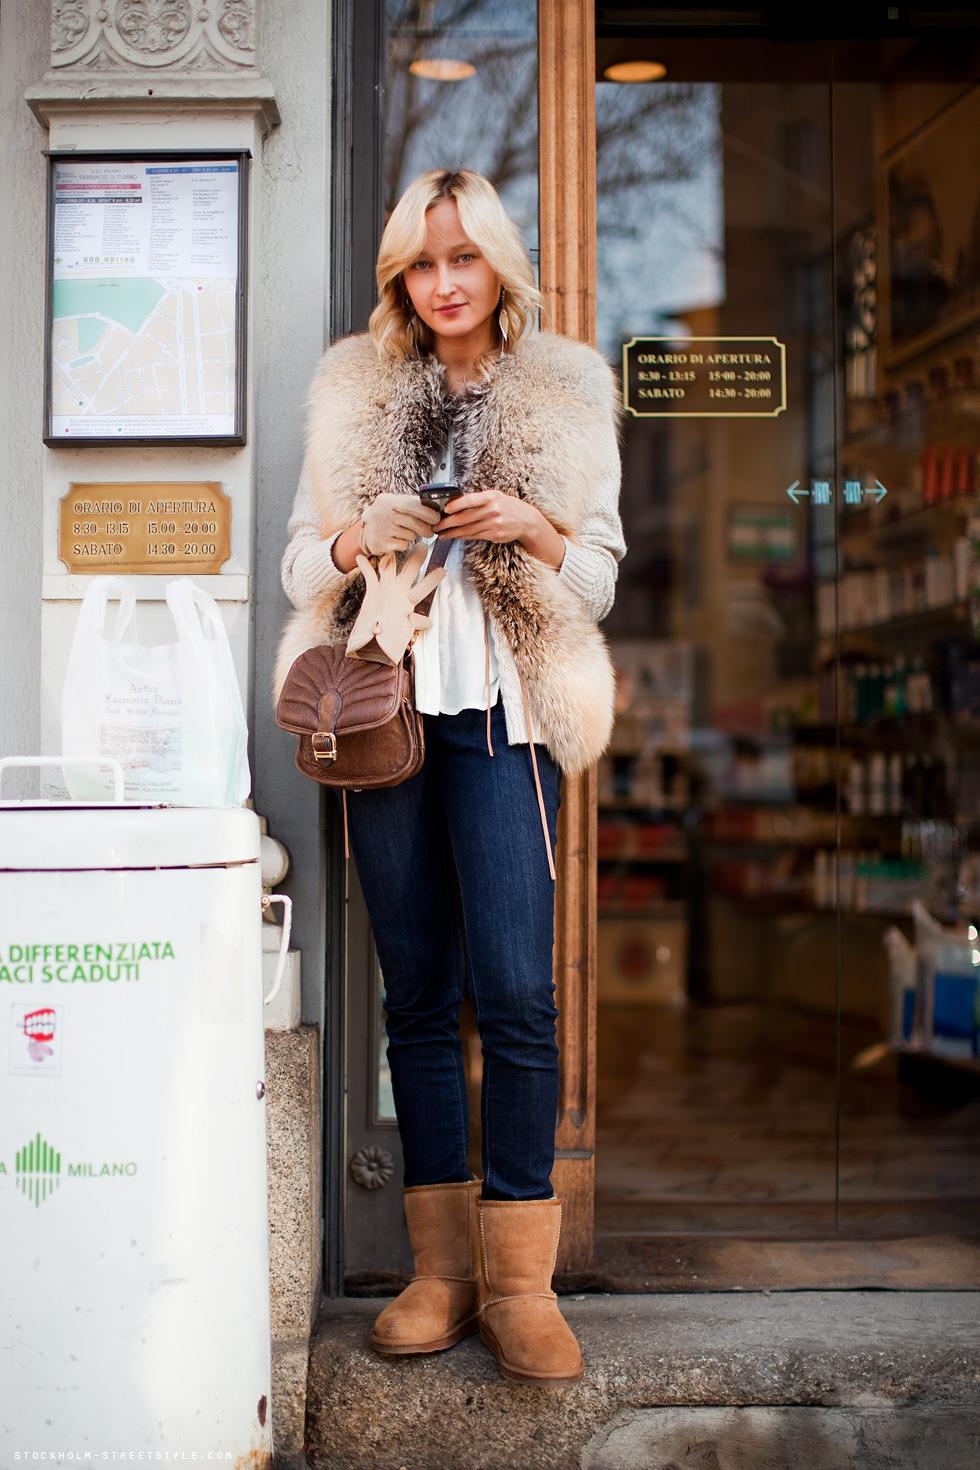 geeks fashion: Keep your feet warm with fashion shoes ...